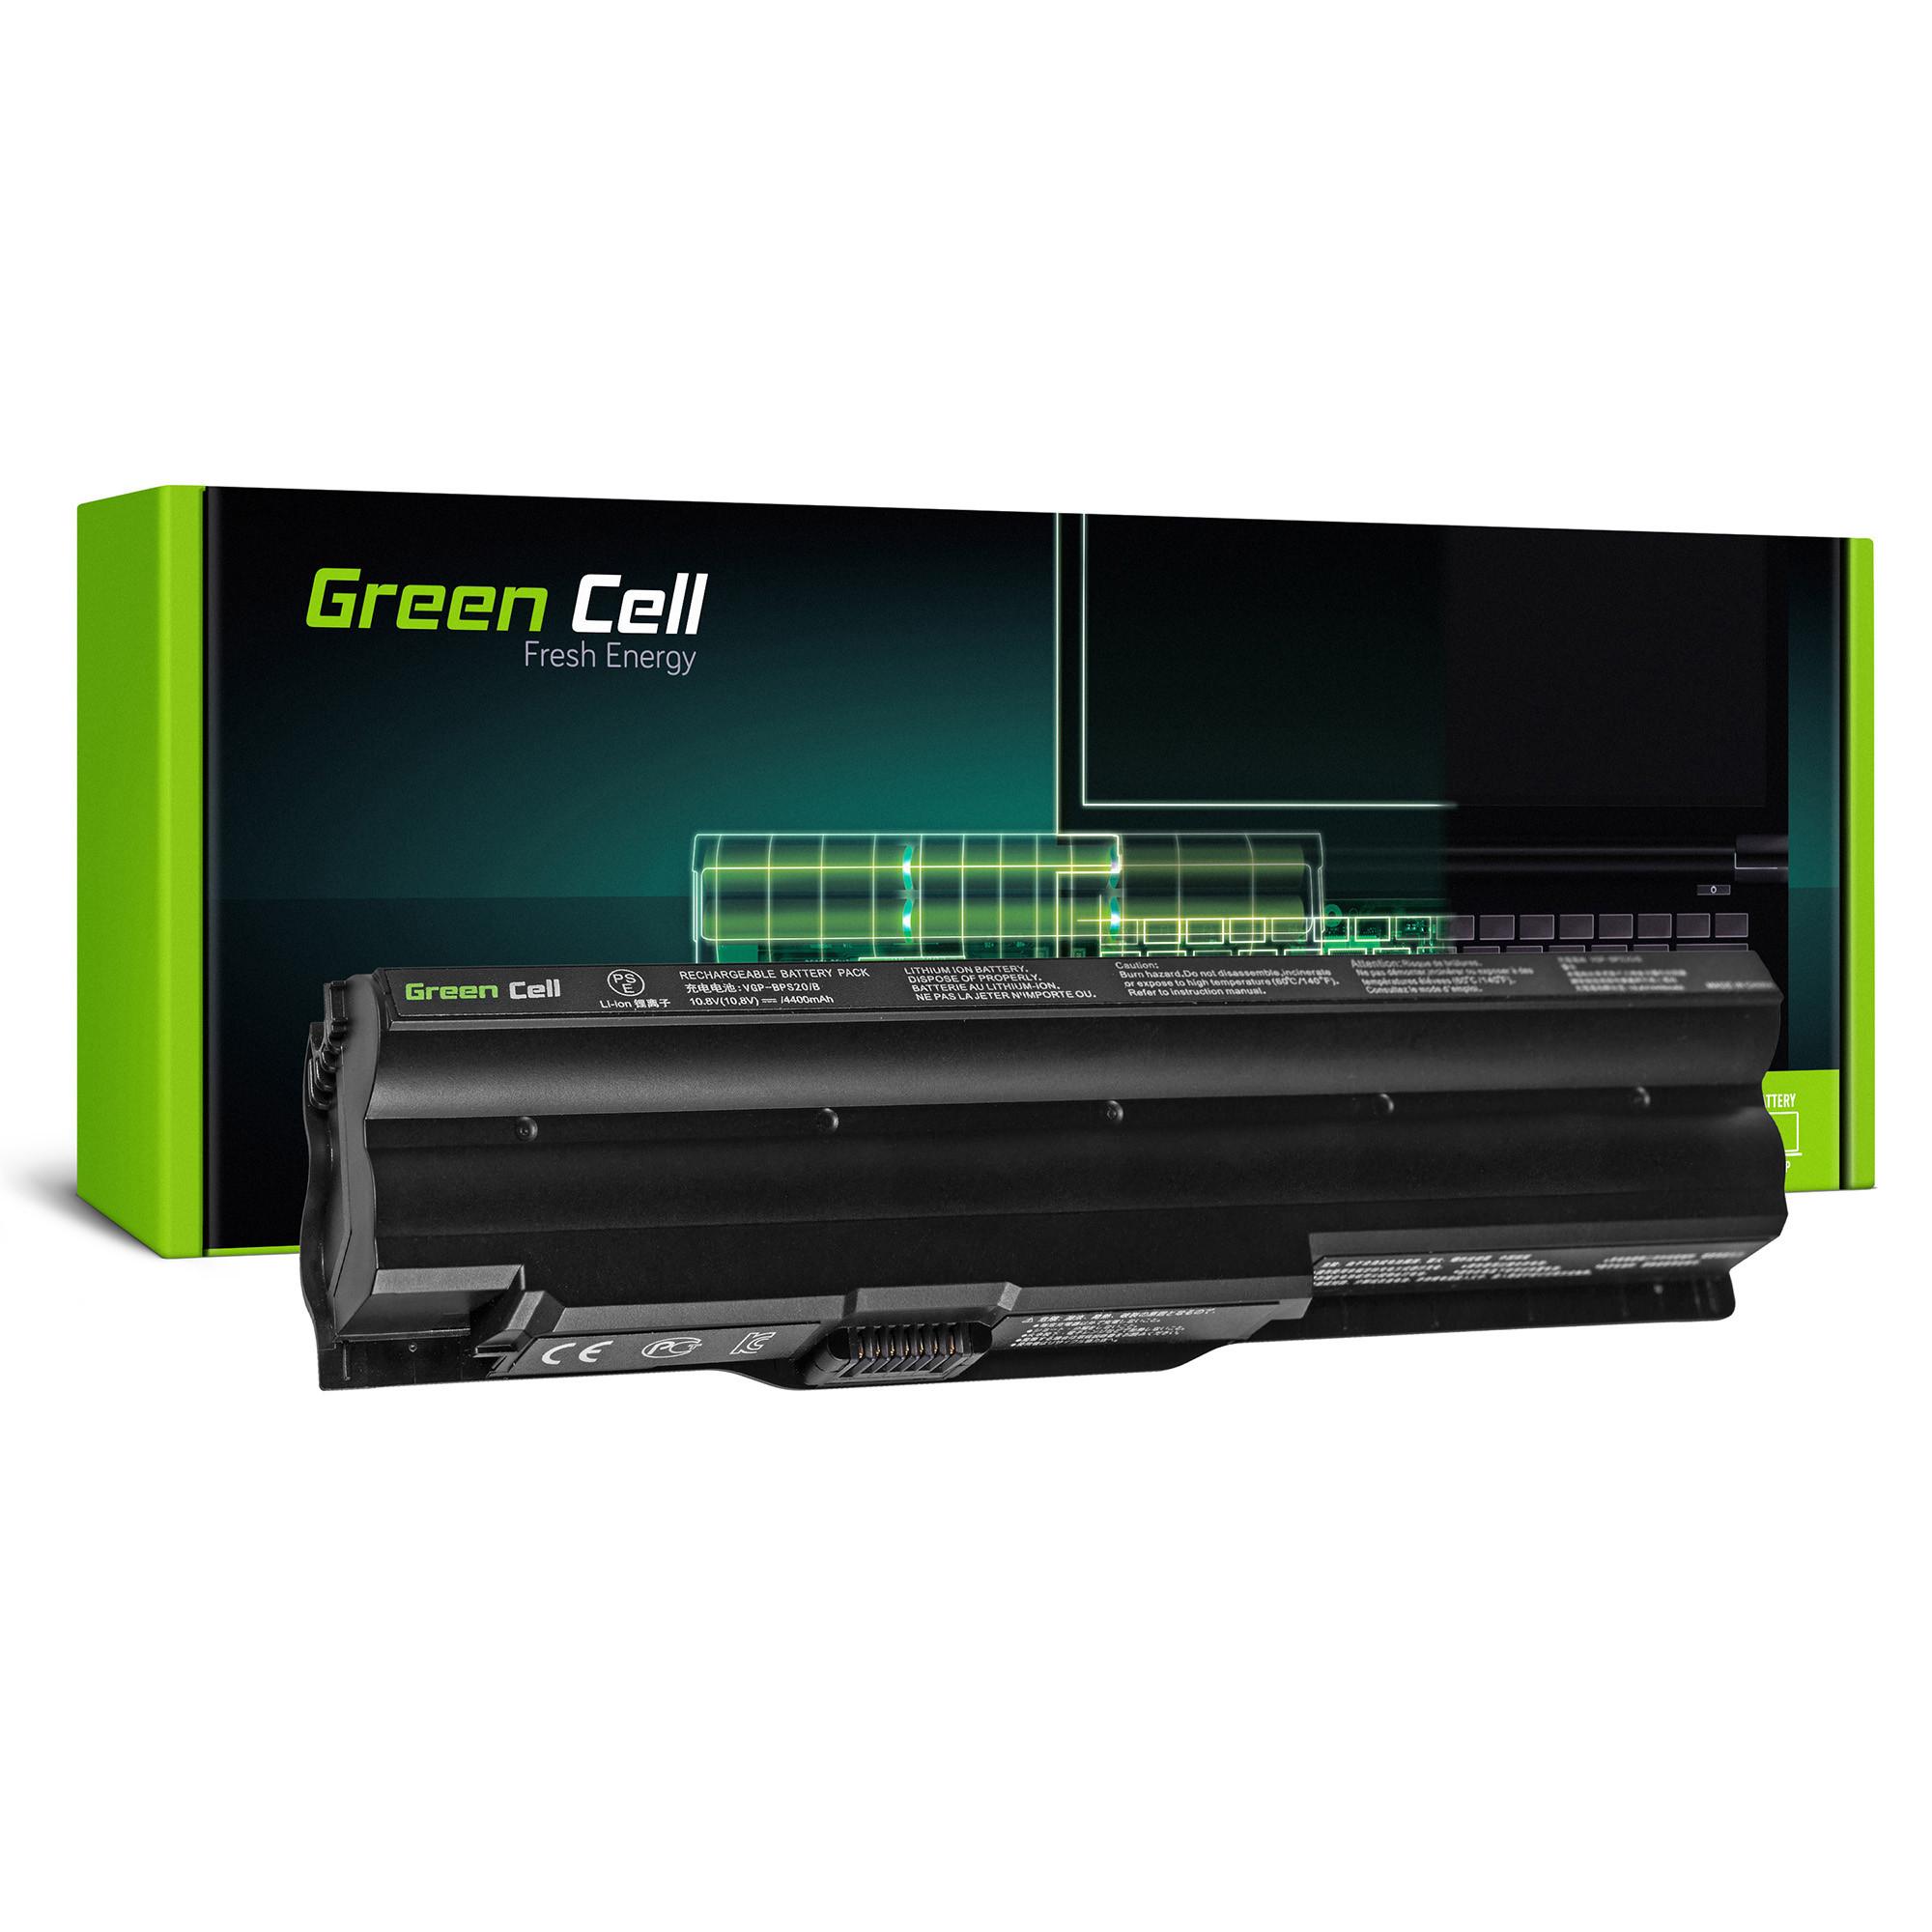 Battery for Sony Vaio VPCZ12S1C CN1 VPCZ13M9E/B / 11,1V 4400mAh